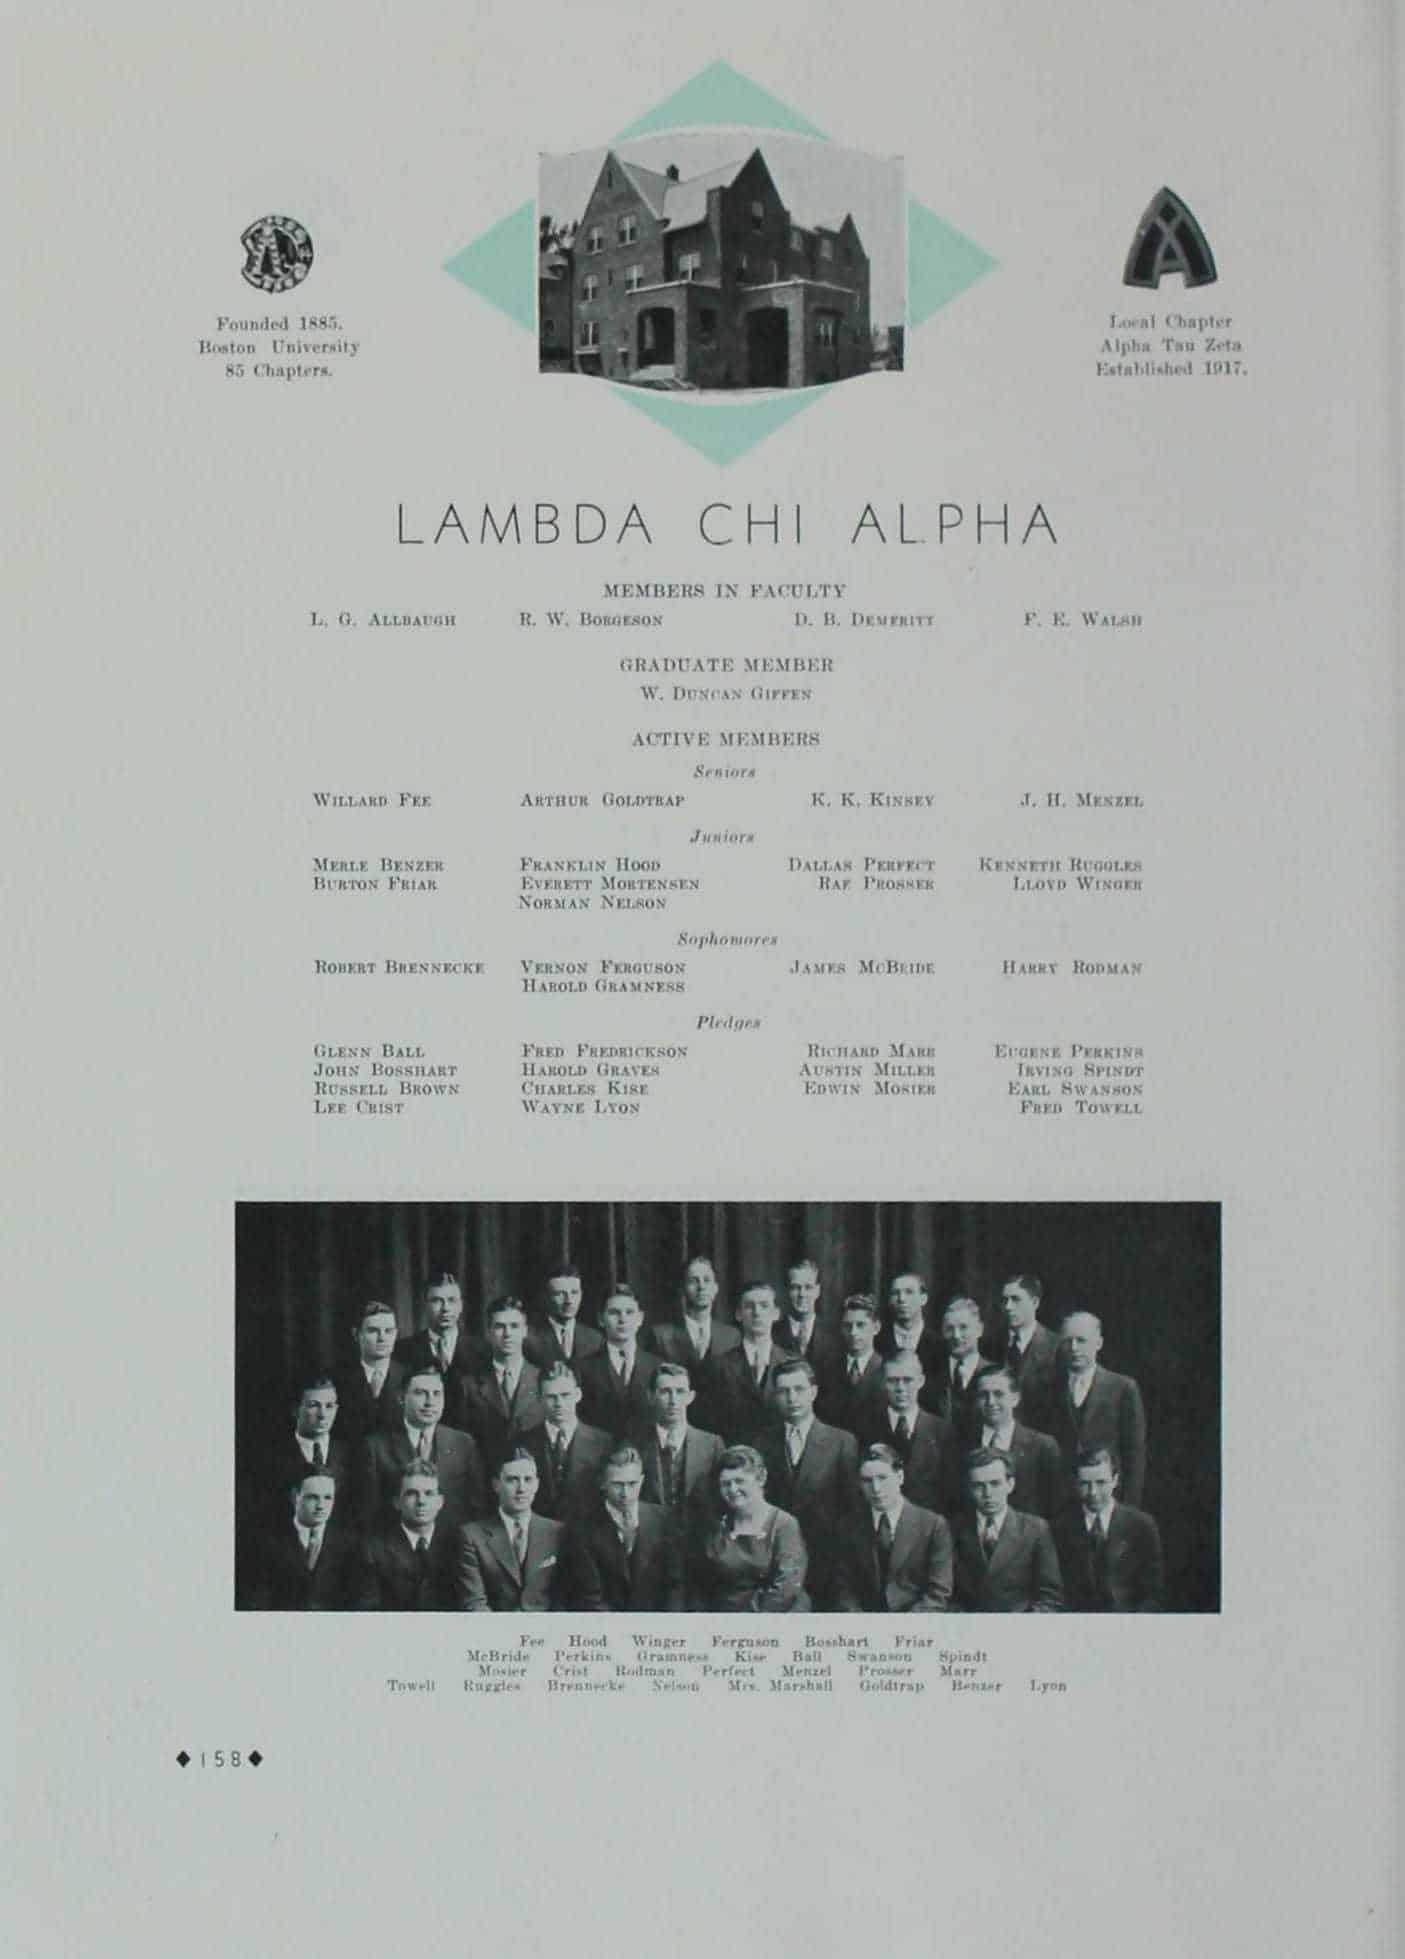 1933 Lambda Chi Alpha